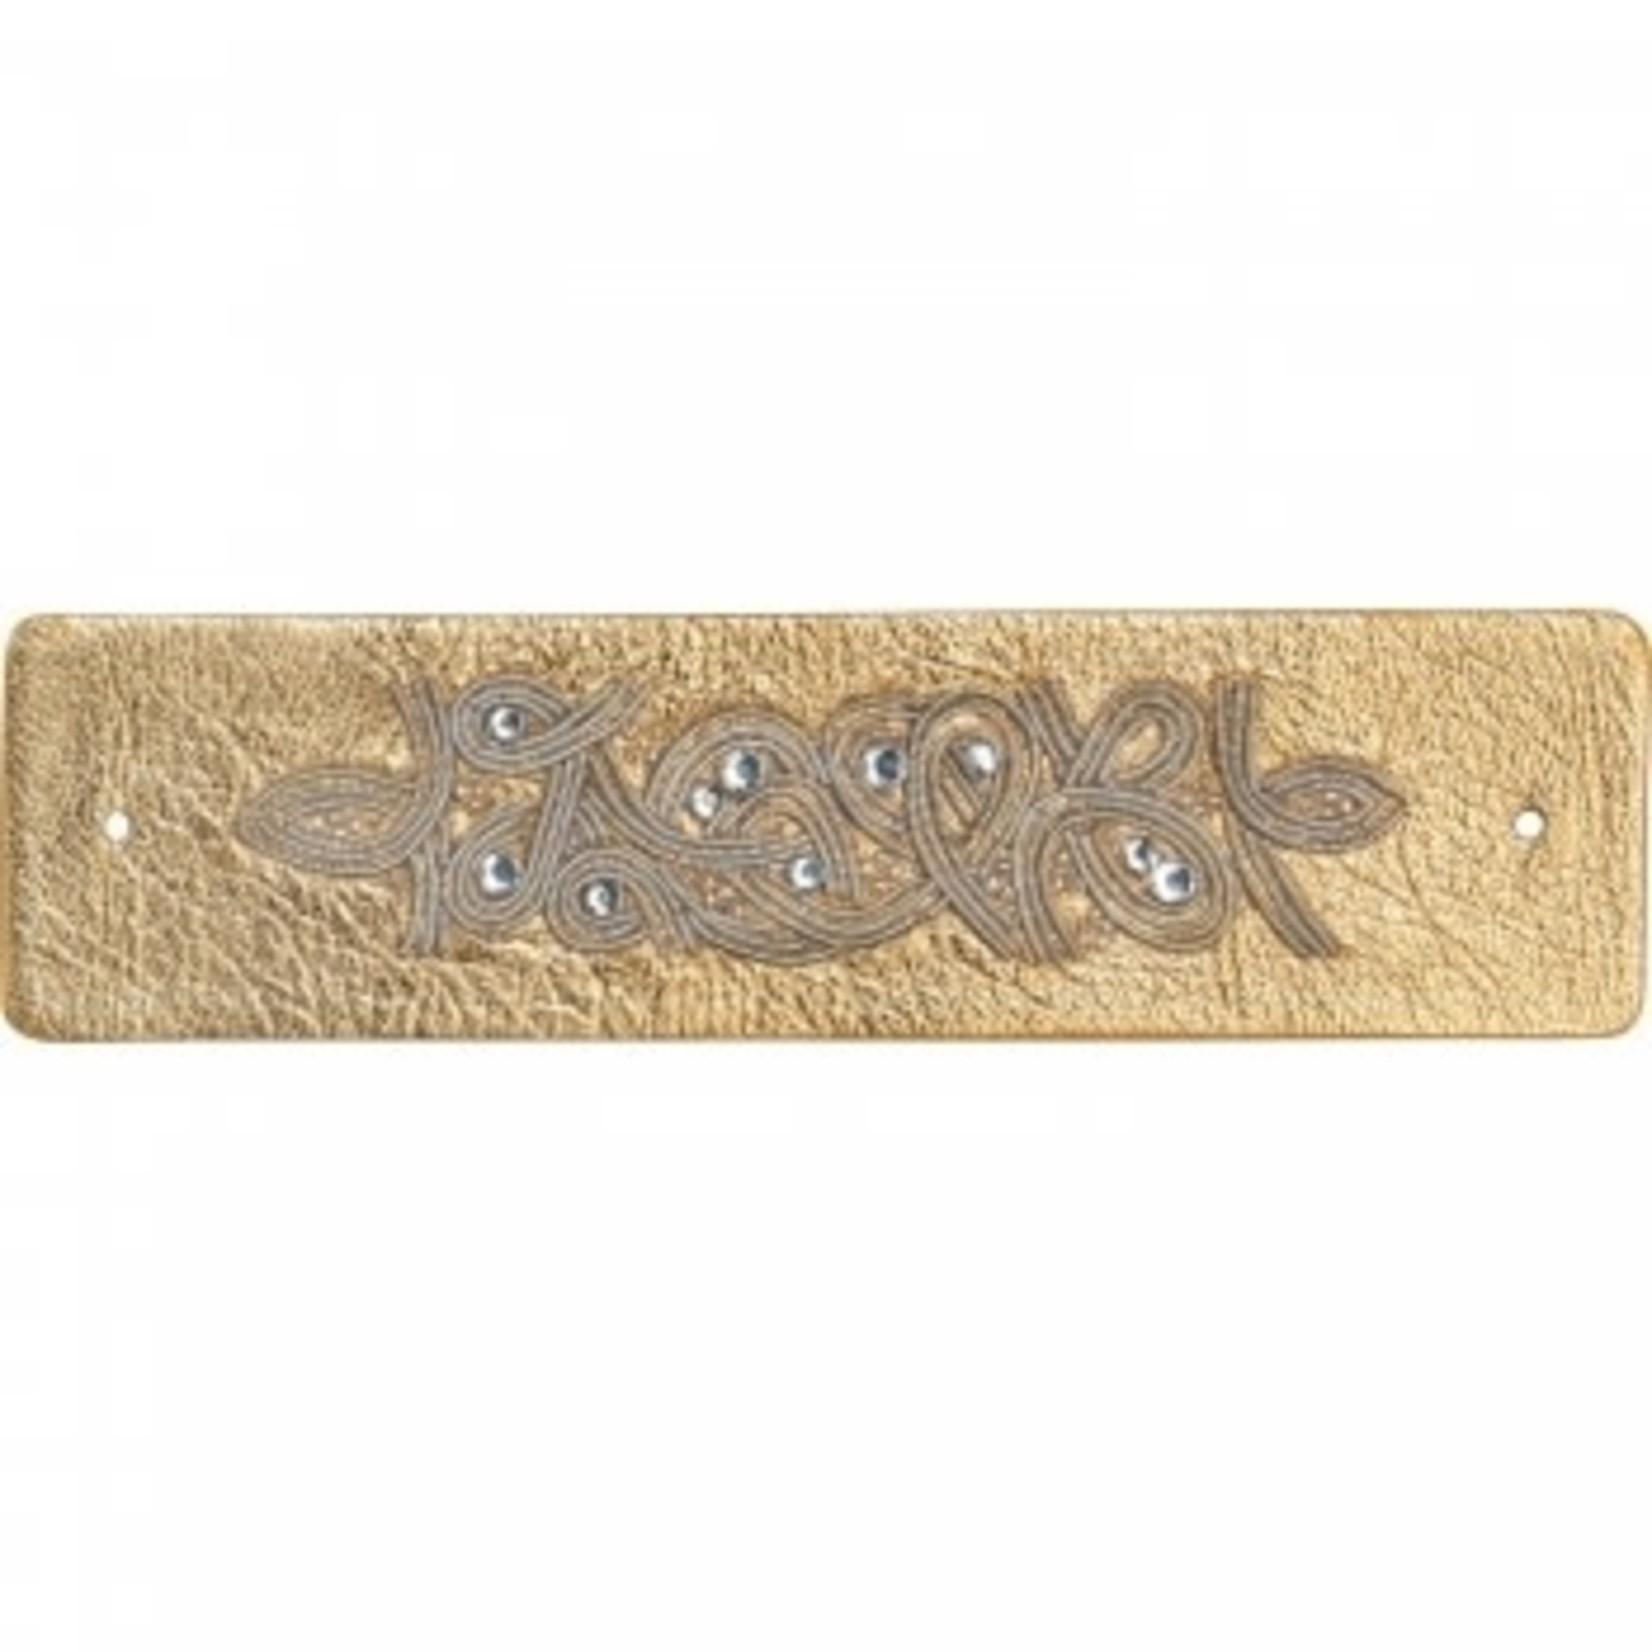 Brighton 65446 Leather/Christo/GoldVienna